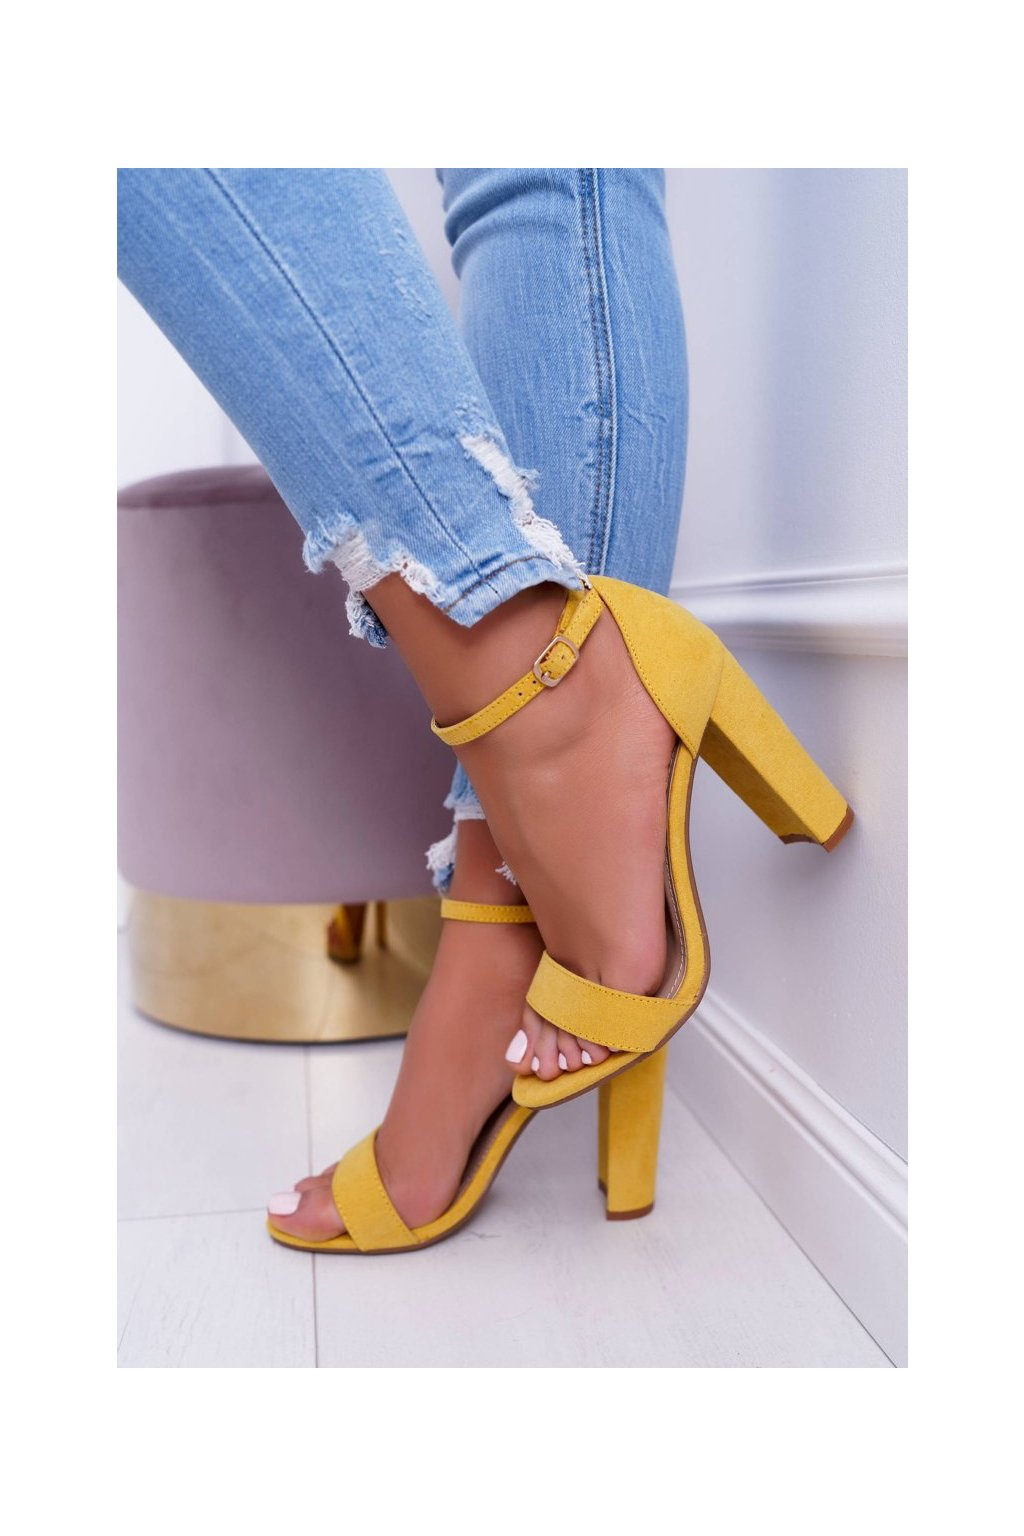 Dámske Sandále na podpätku Semišové žlté Anastasie NJSK J76-12